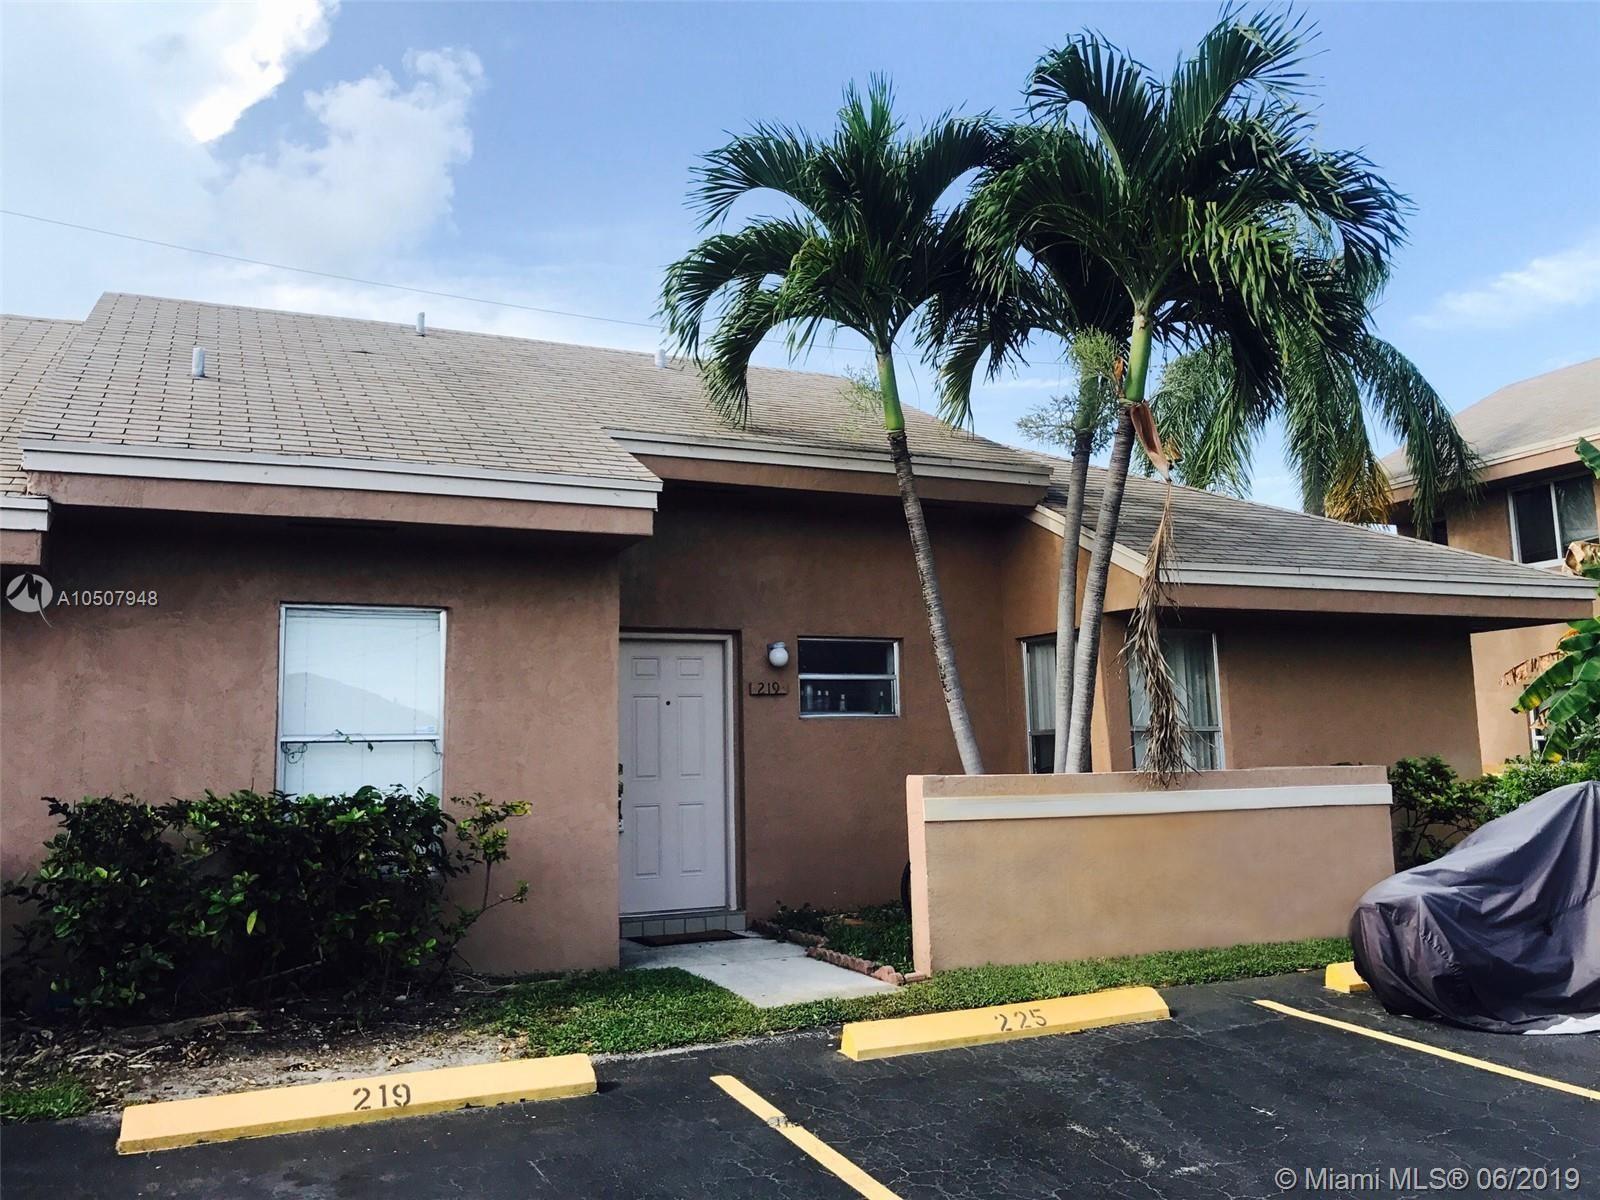 219 SE 8TH ST #601, Hallandale Beach, FL 33009 - MLS#: A10507948